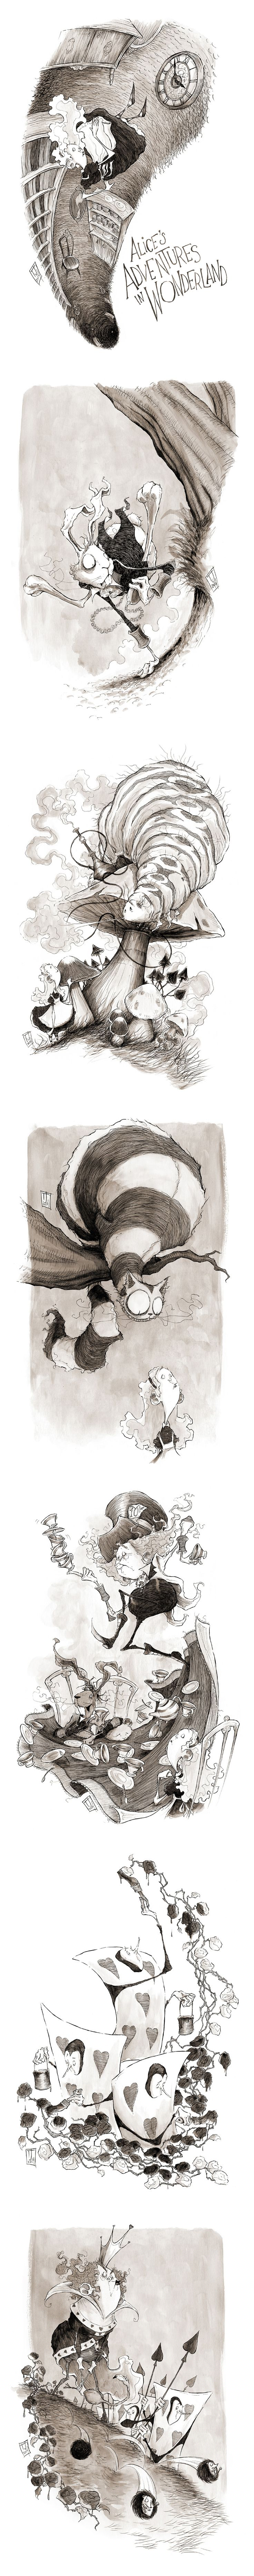 Alice's Adventures in Wonderland by Ripplen.deviantart.com on @deviantART